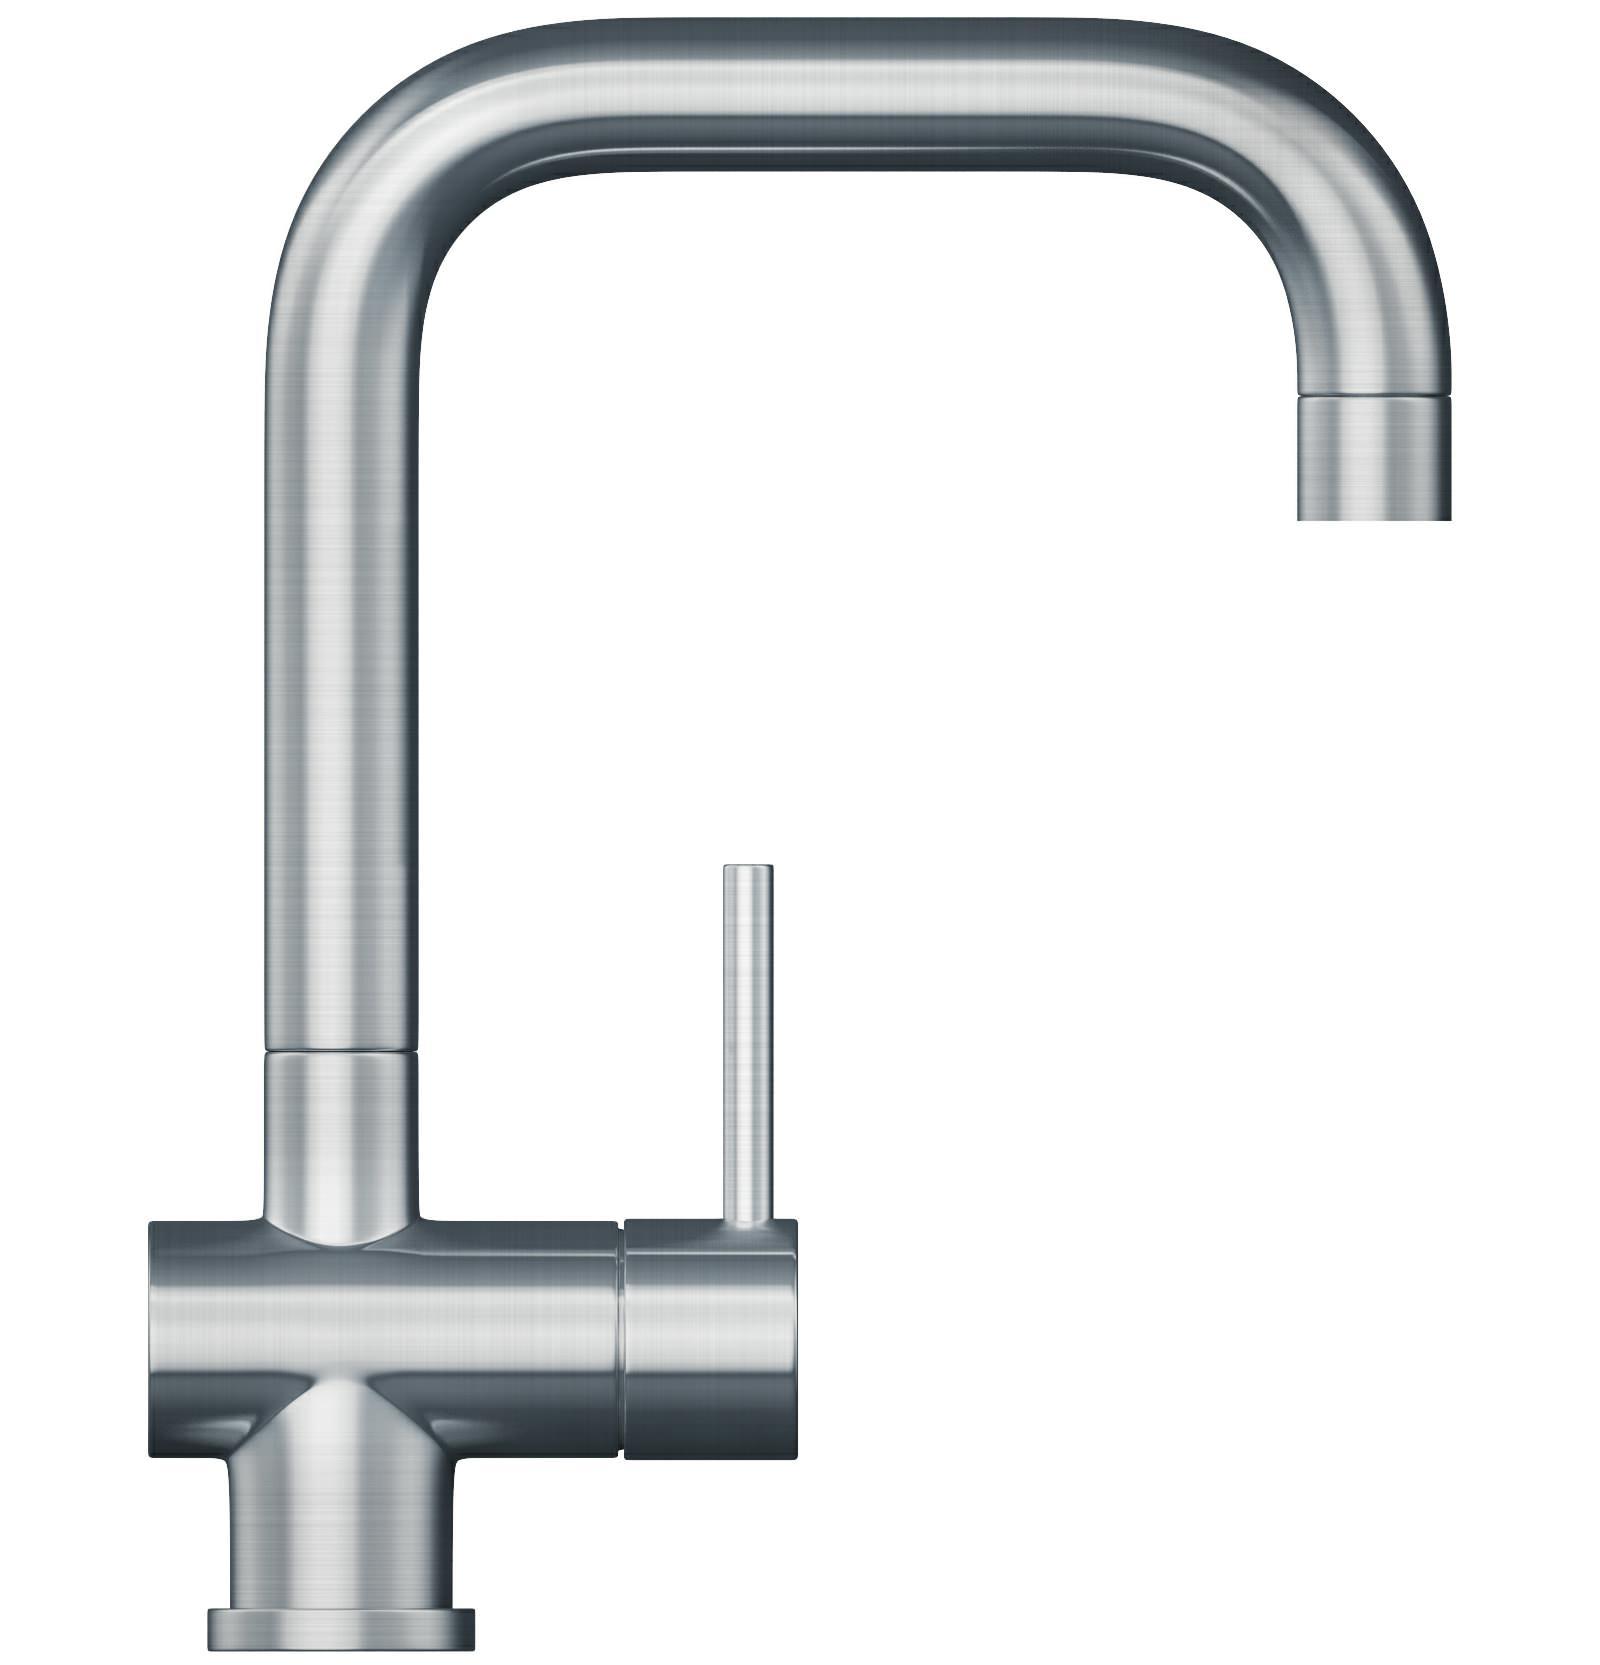 Franke Kitchen Sinks : Franke Nyon Stainless Steel Kitchen Sink Mixer Tap